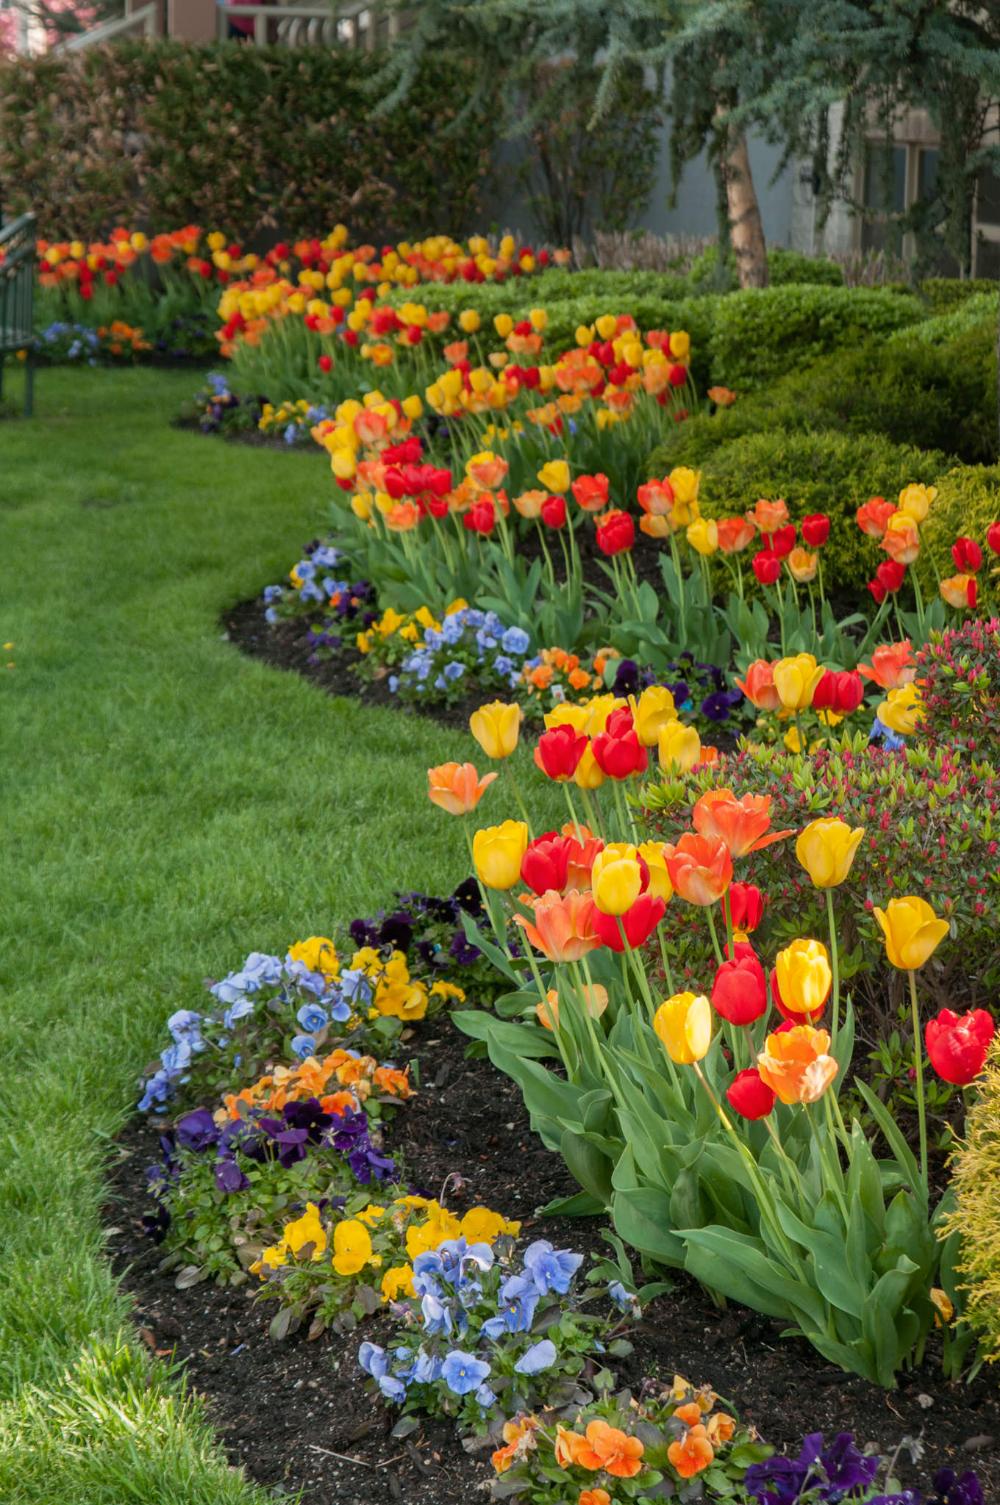 Colorblends Tulips In The Landscape Bulbs Garden Design Garden Bulbs Beautiful Flowers Garden